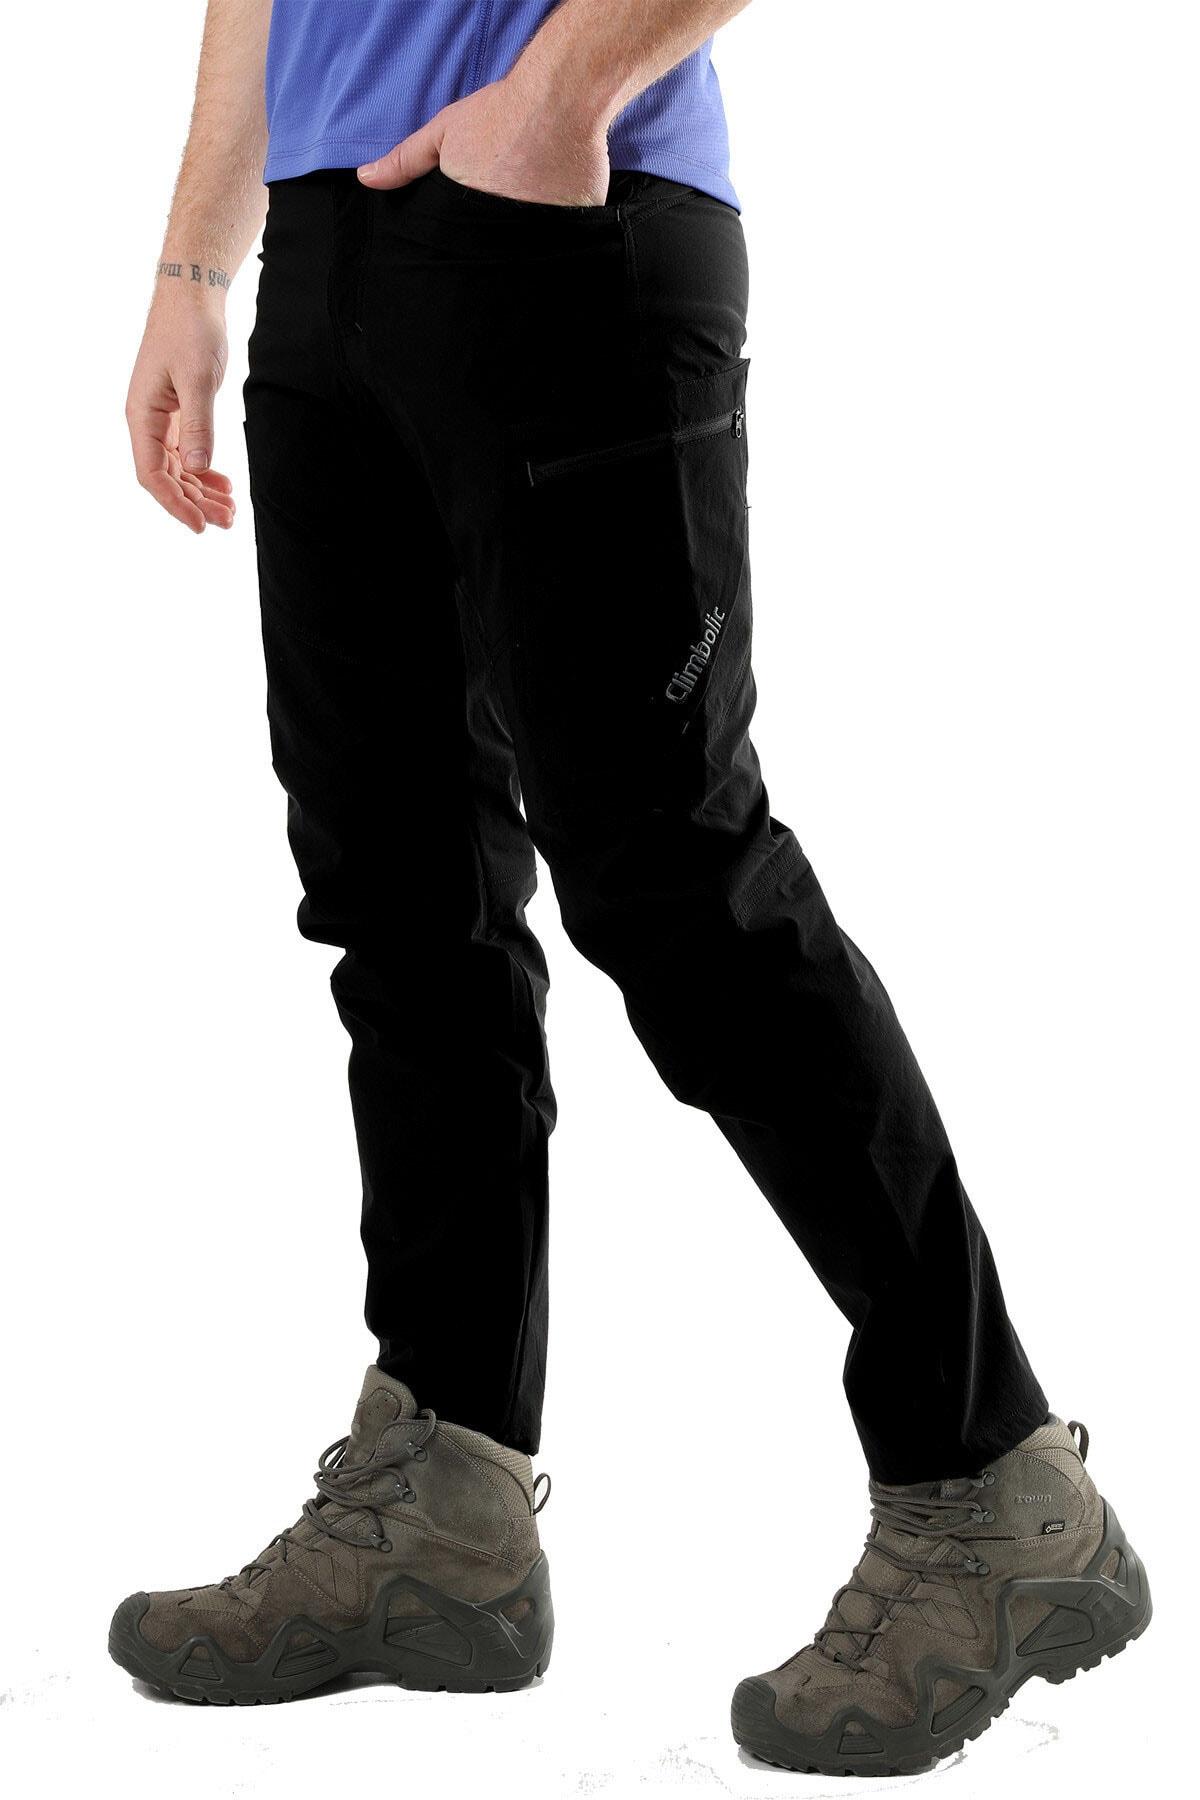 Climbolic Discovery Outdoor Pantolon Siyah 1